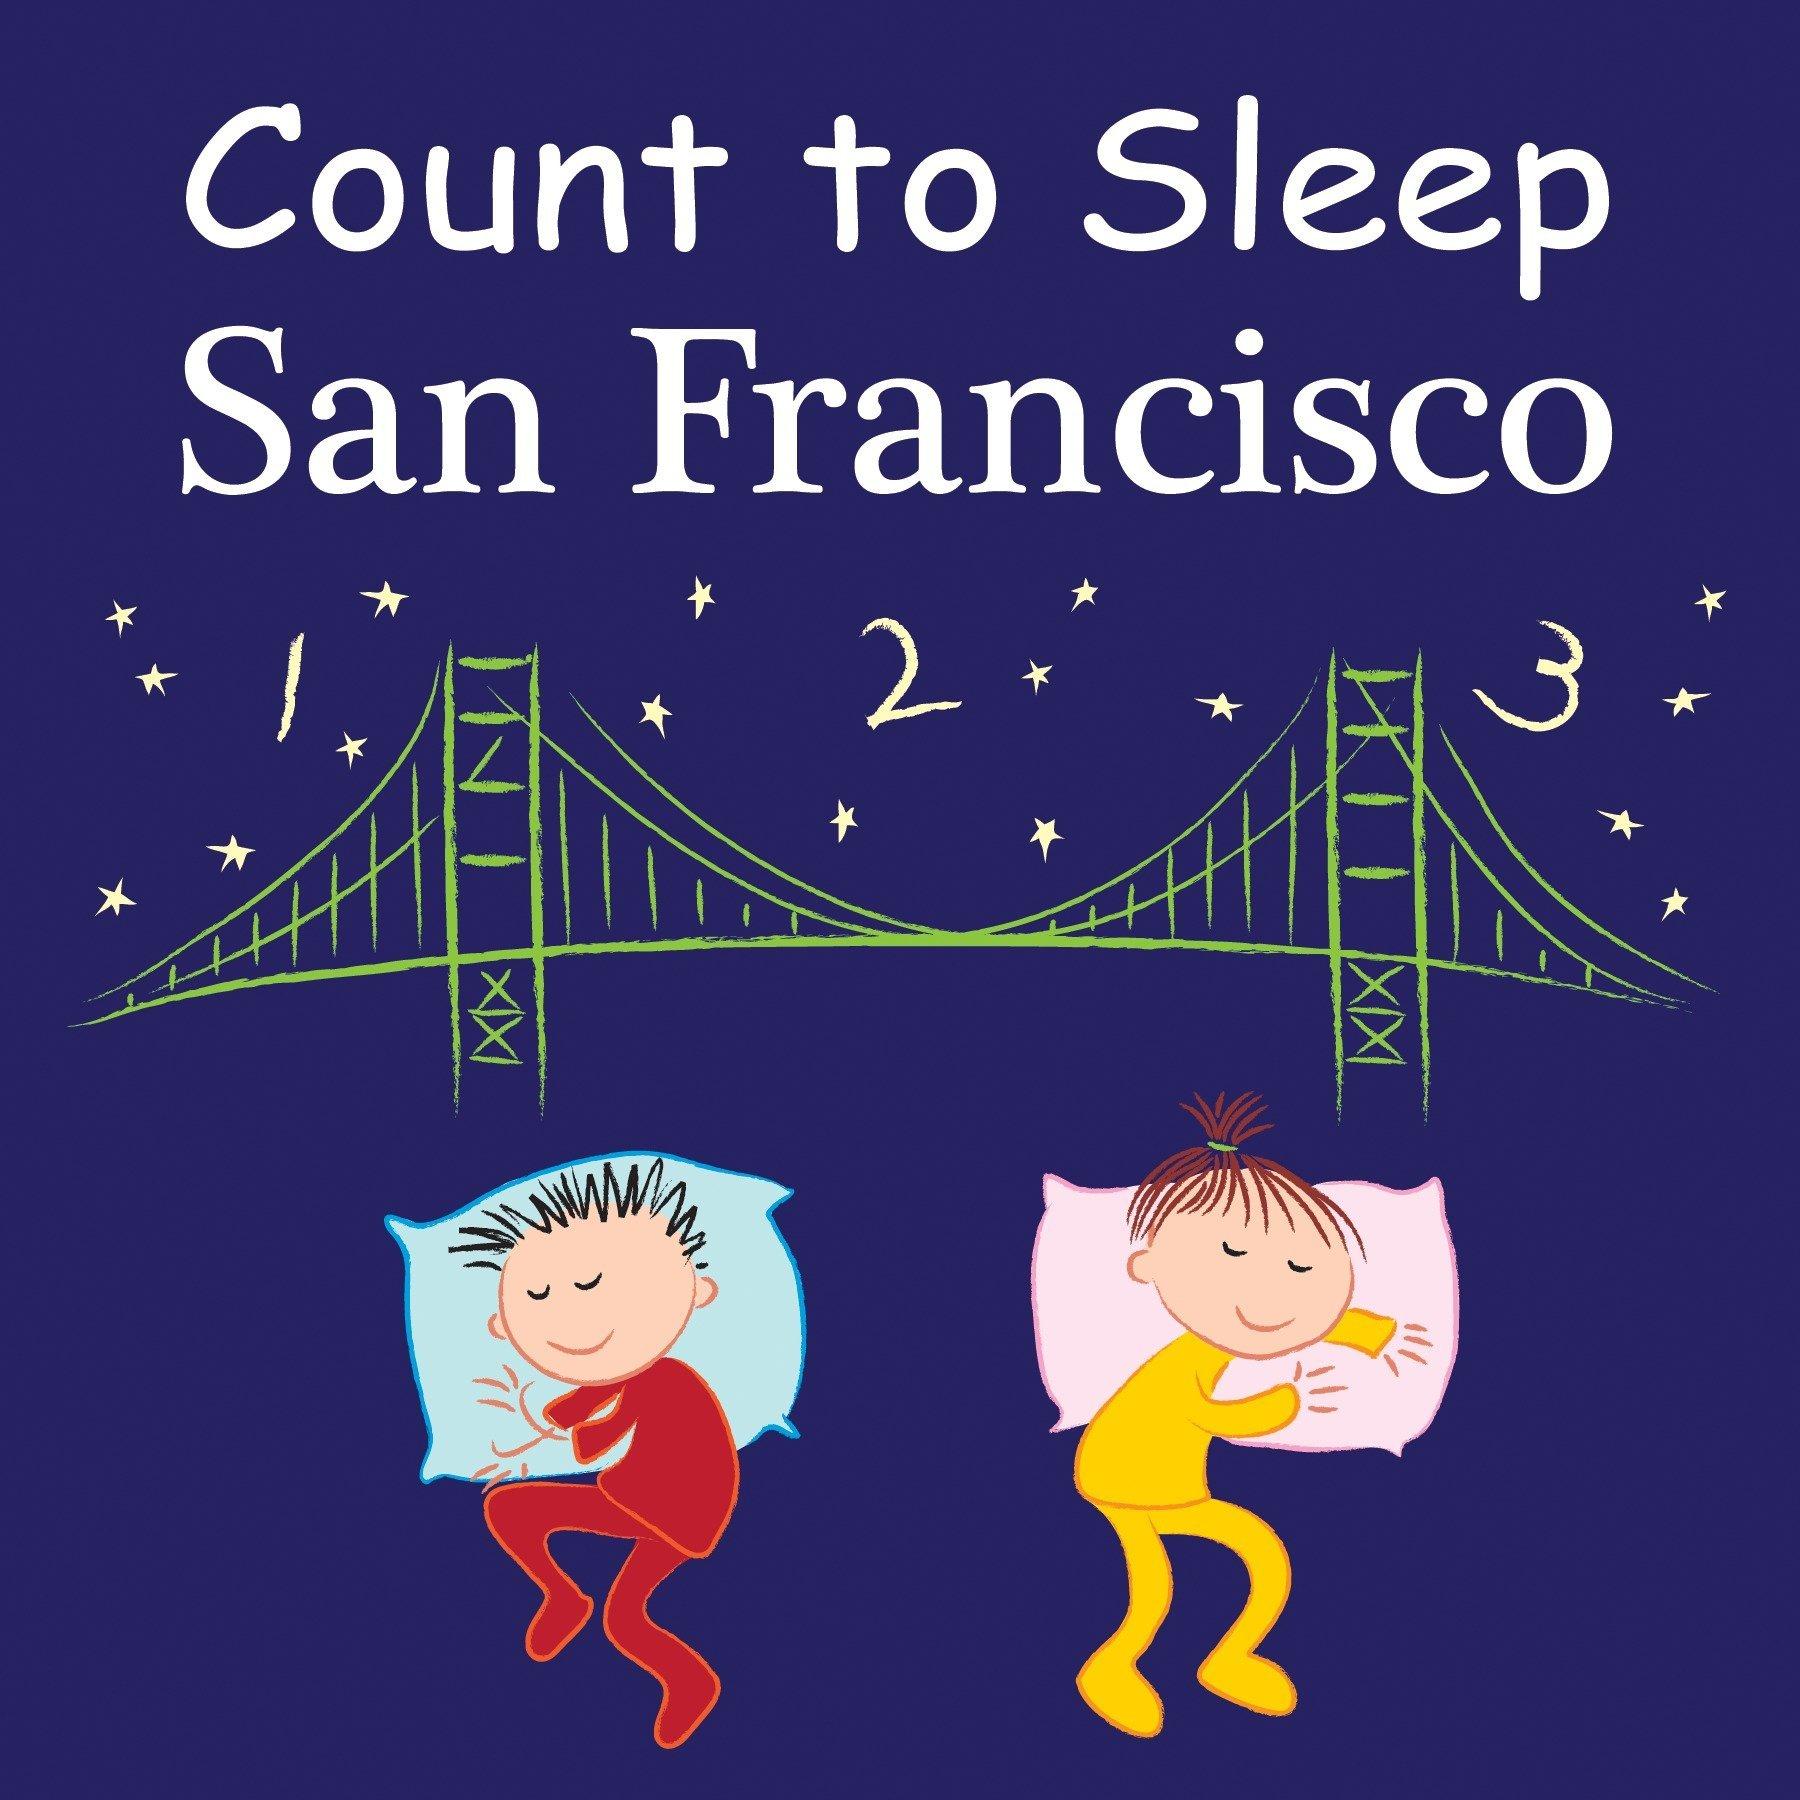 Count To Sleep San Francisco PDF